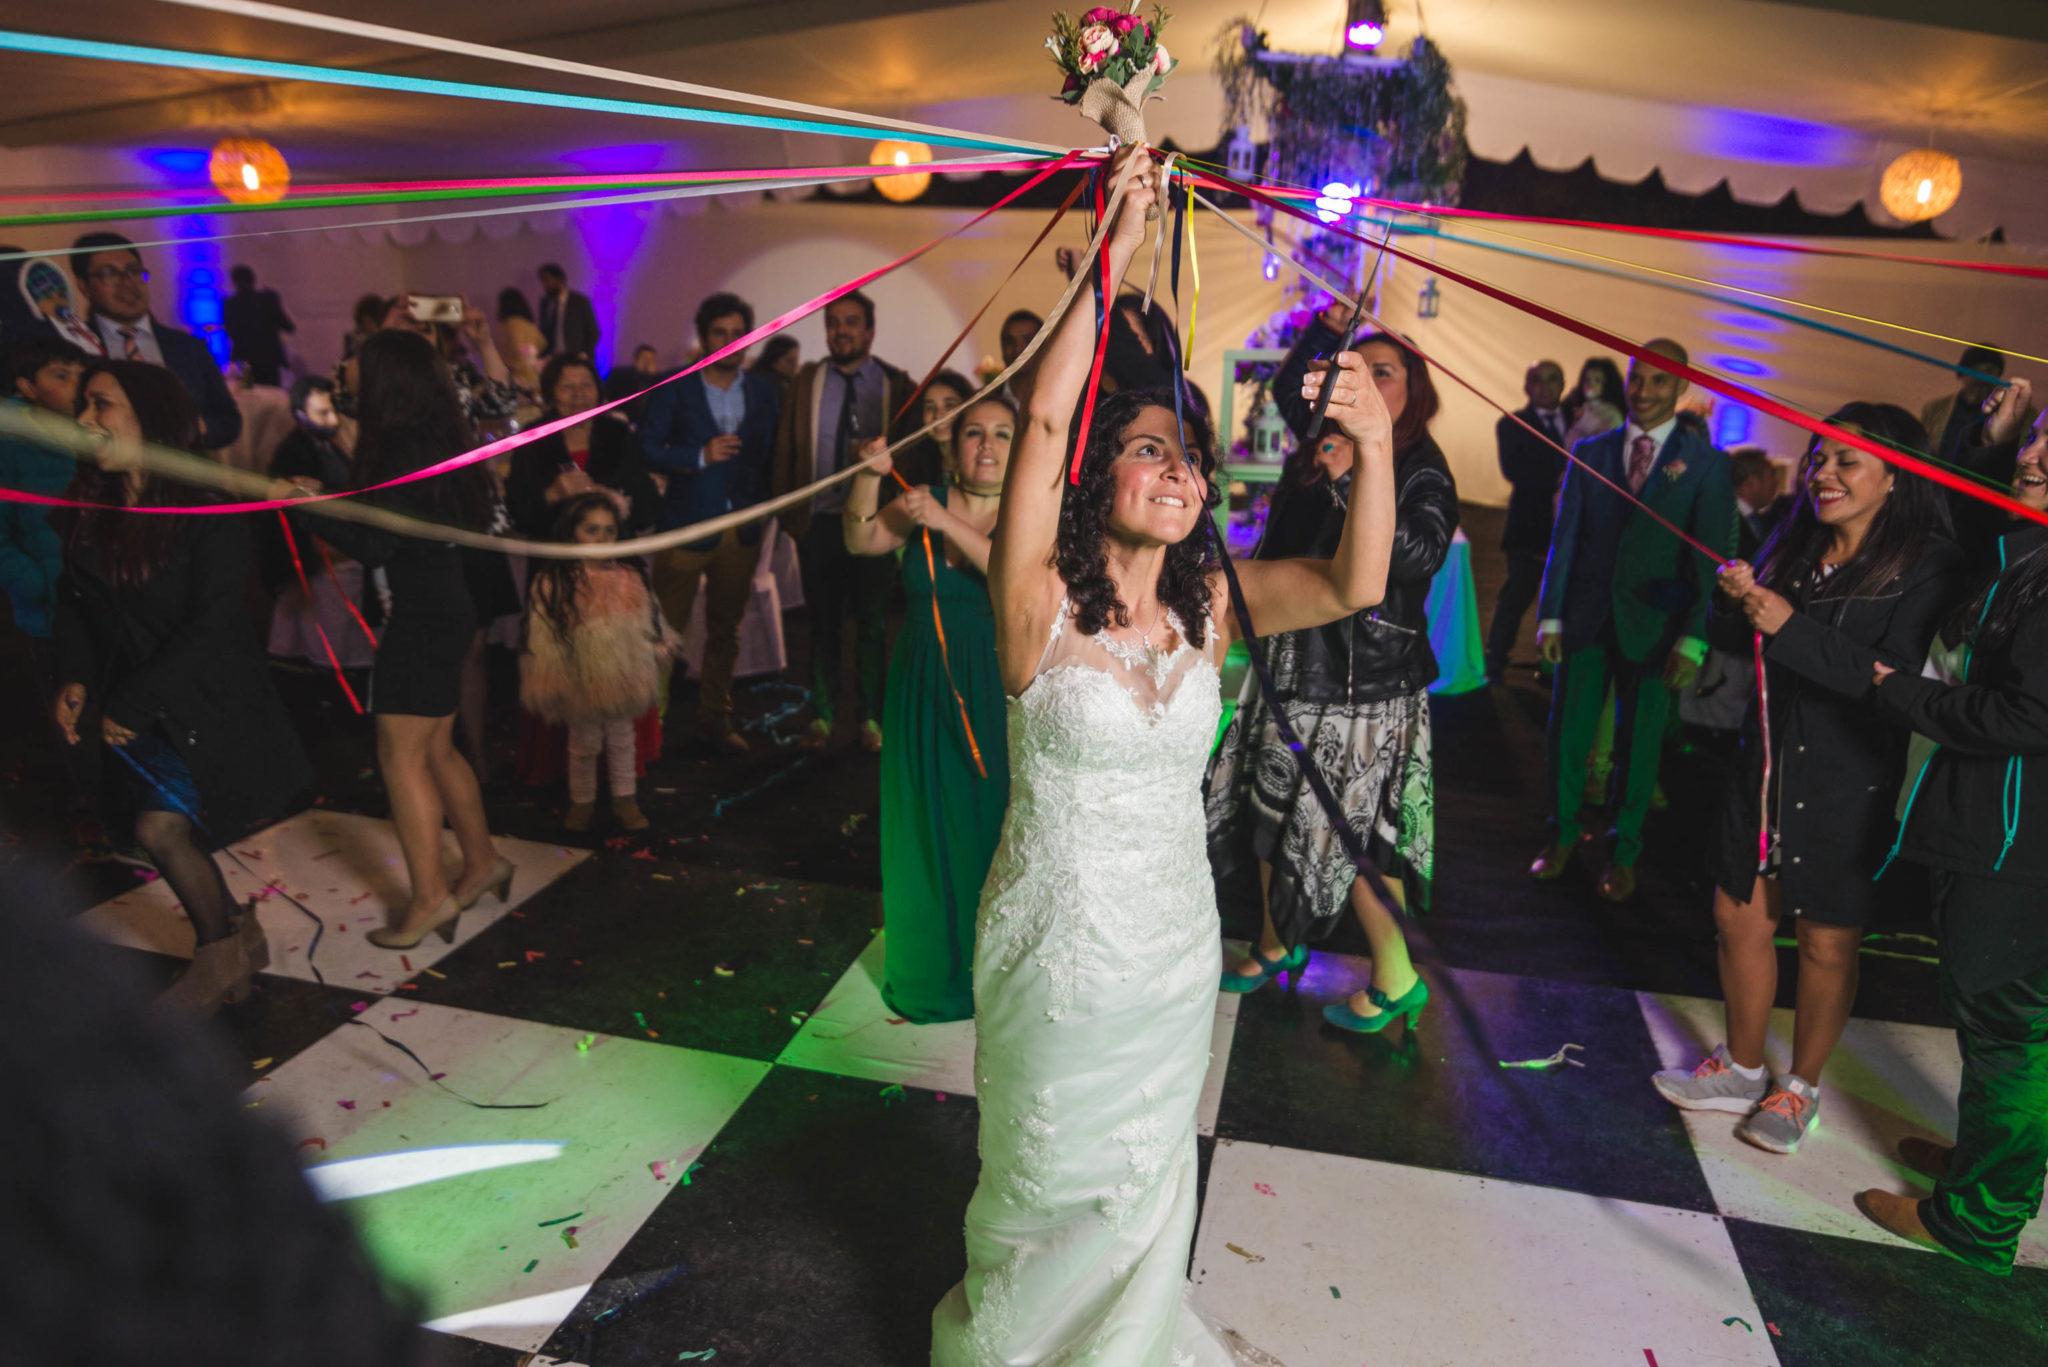 fotografo-matrimonio-boda-Pichilemu-playa-cahuil-diego mena fotografia